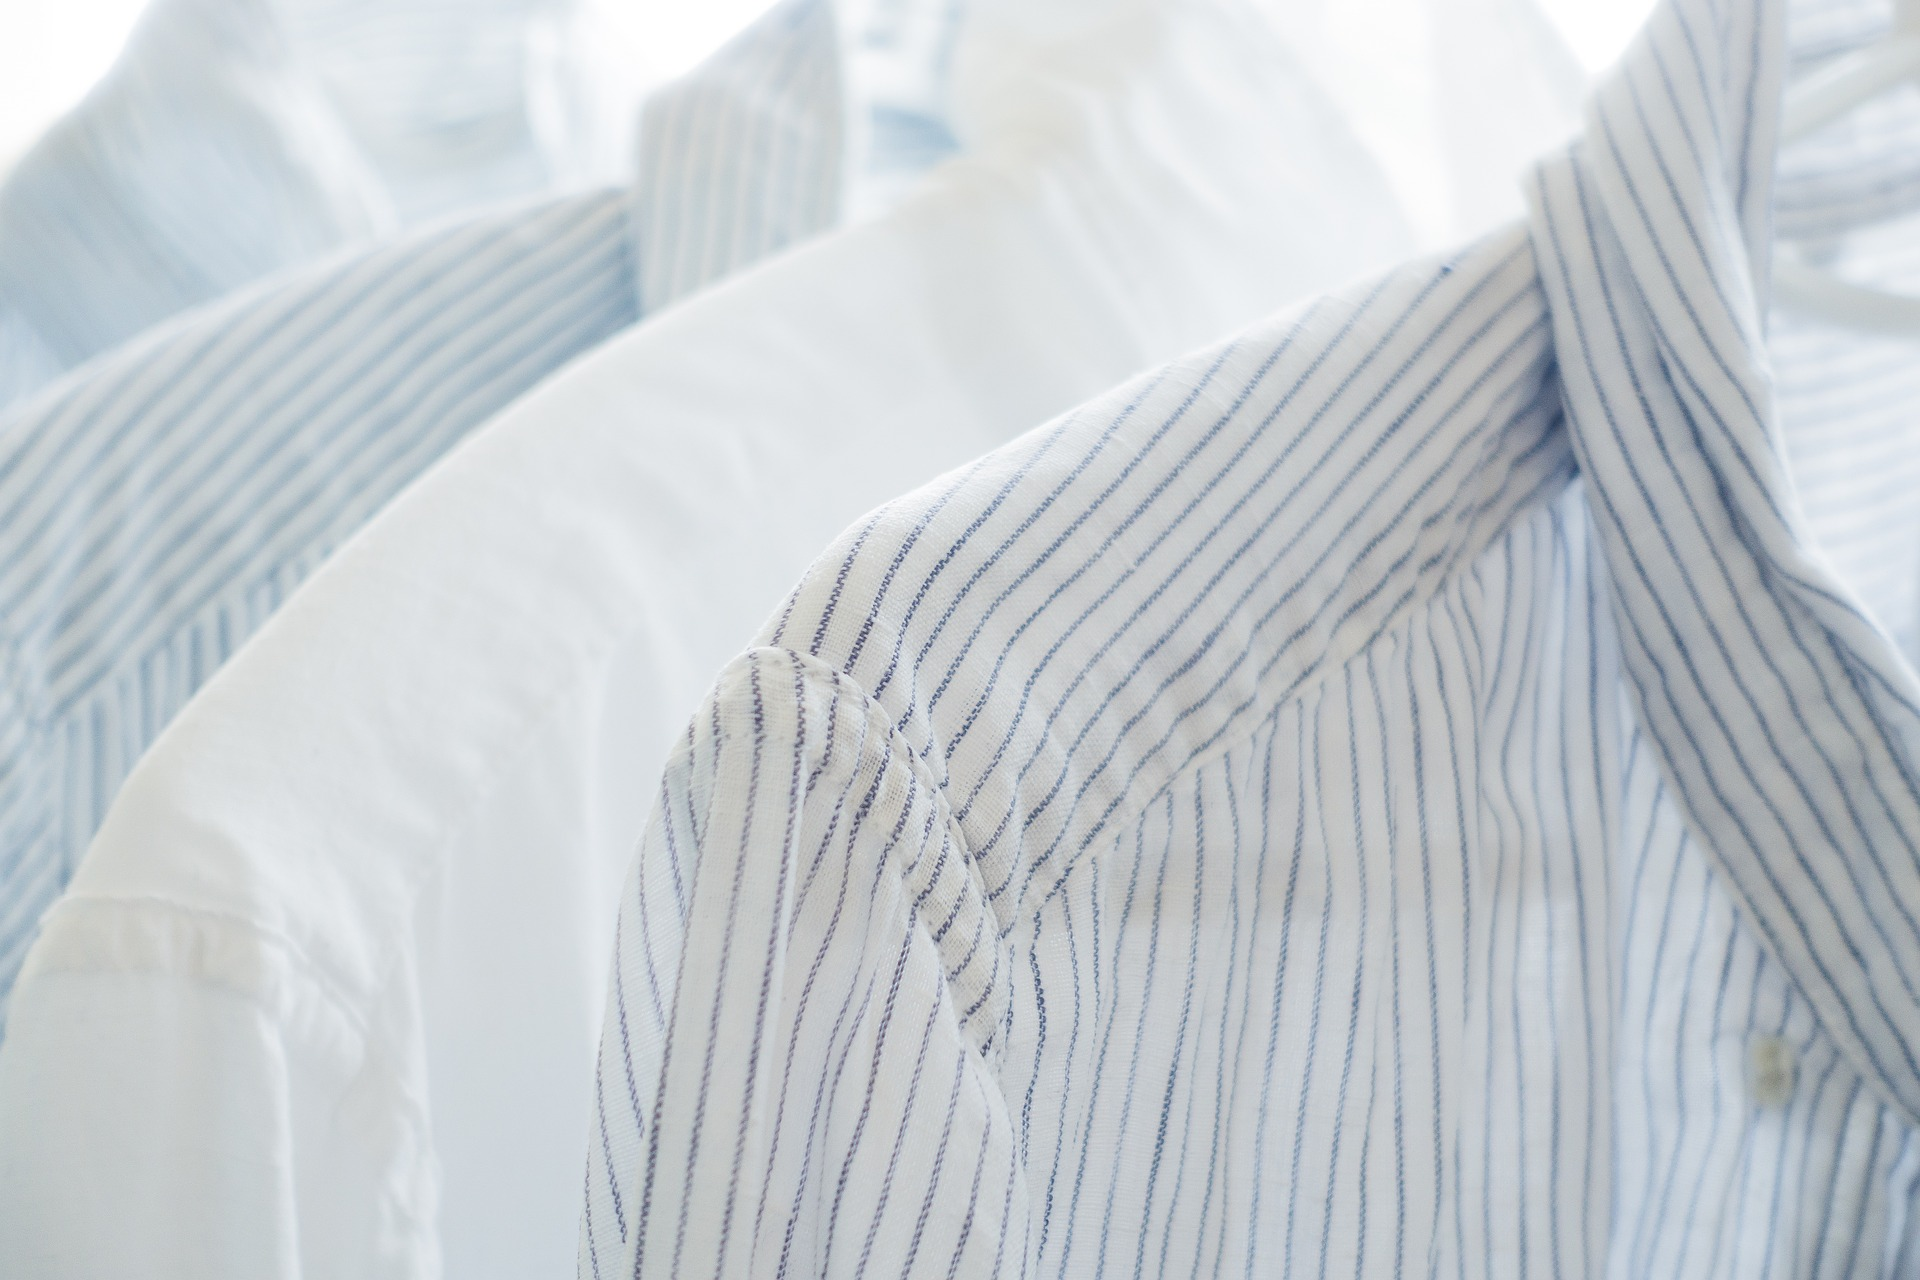 Orice om are in sifonier hainele sale preferate pe care si-ar dori sa le poarte cat mai des cu putinta.